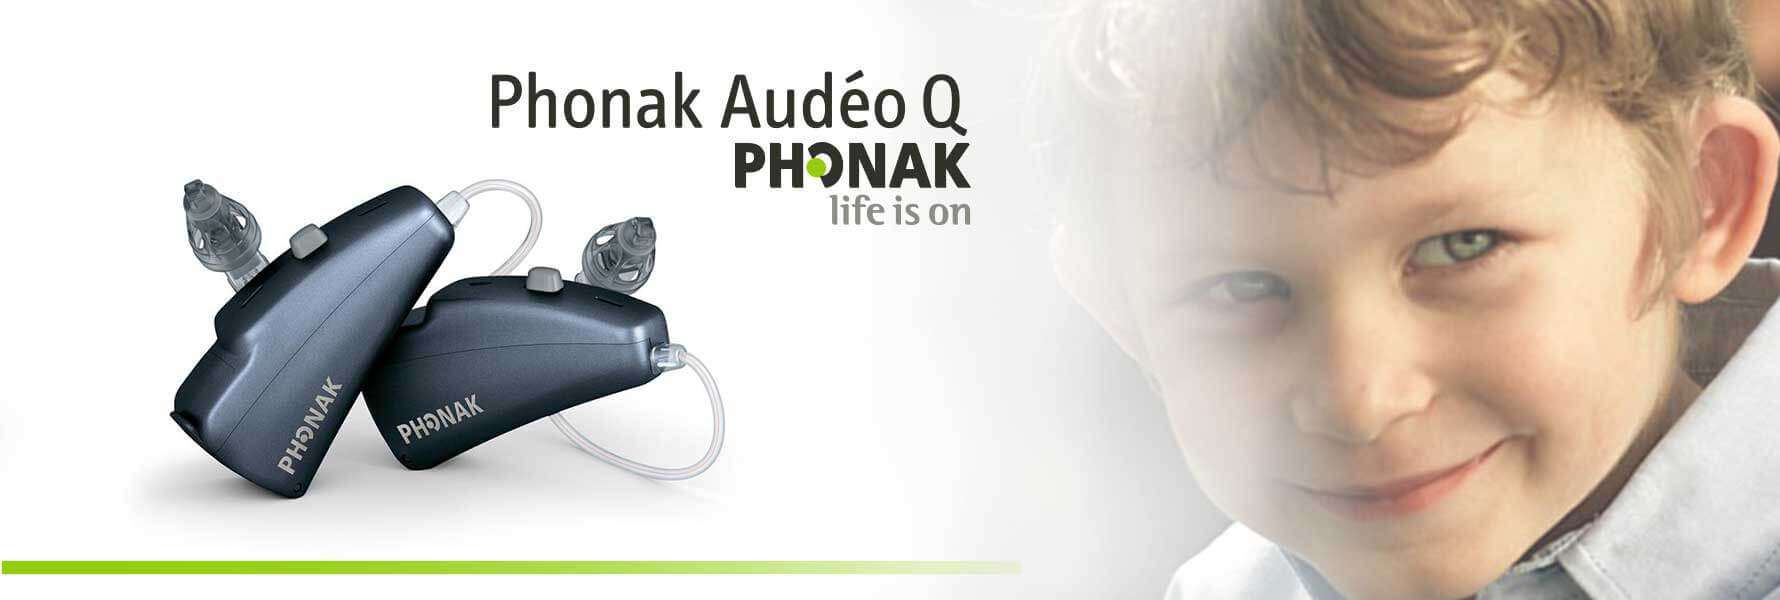 Phonak-Audéo-Q